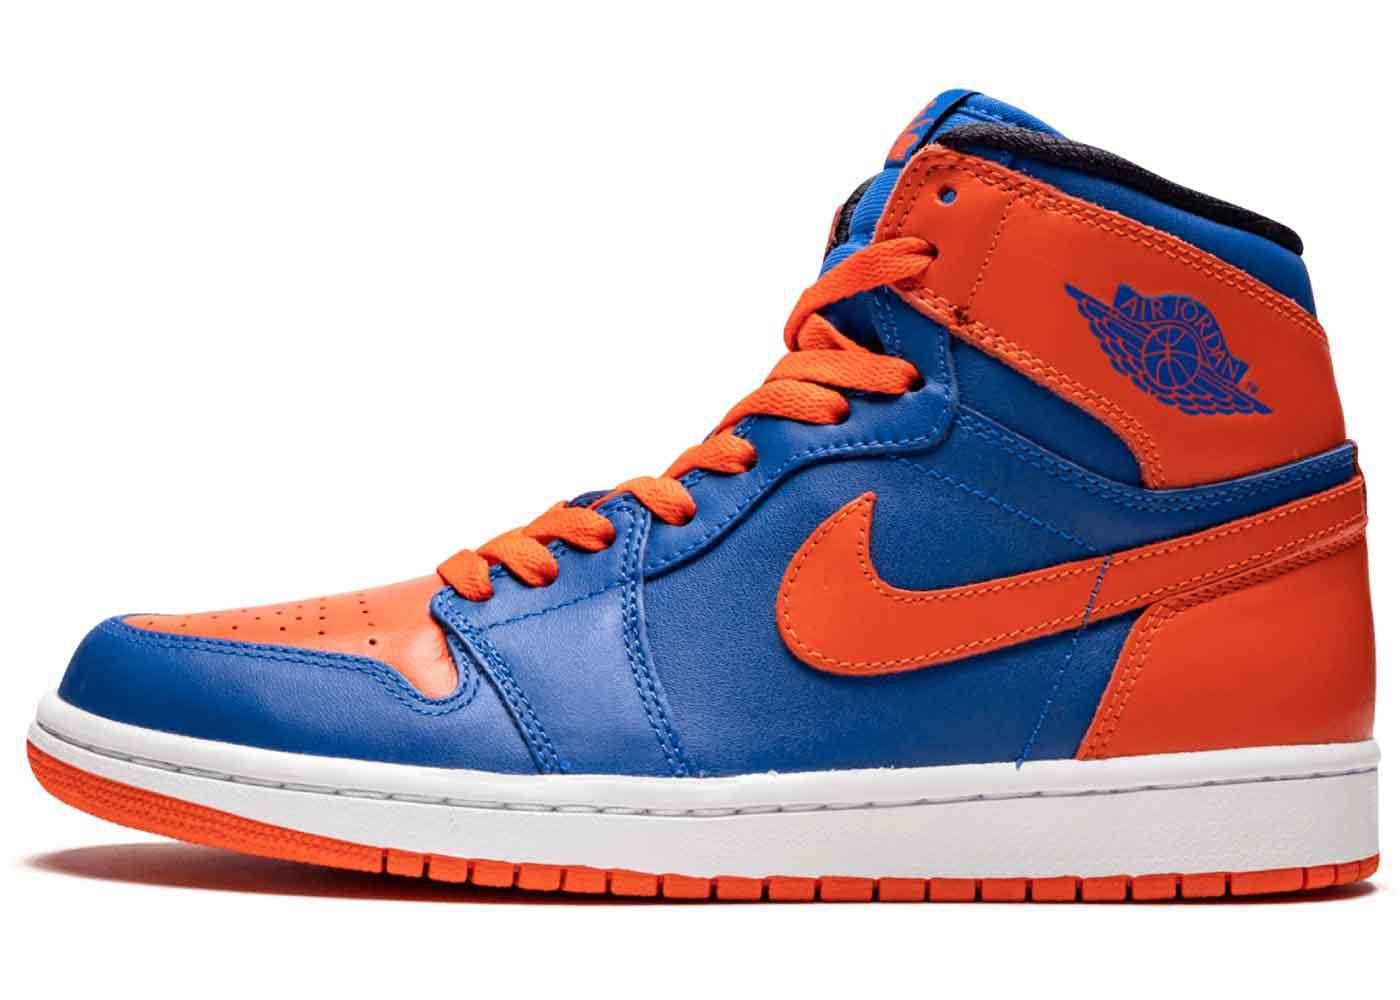 Nike Air Jordan 1 Retro Knicksの写真